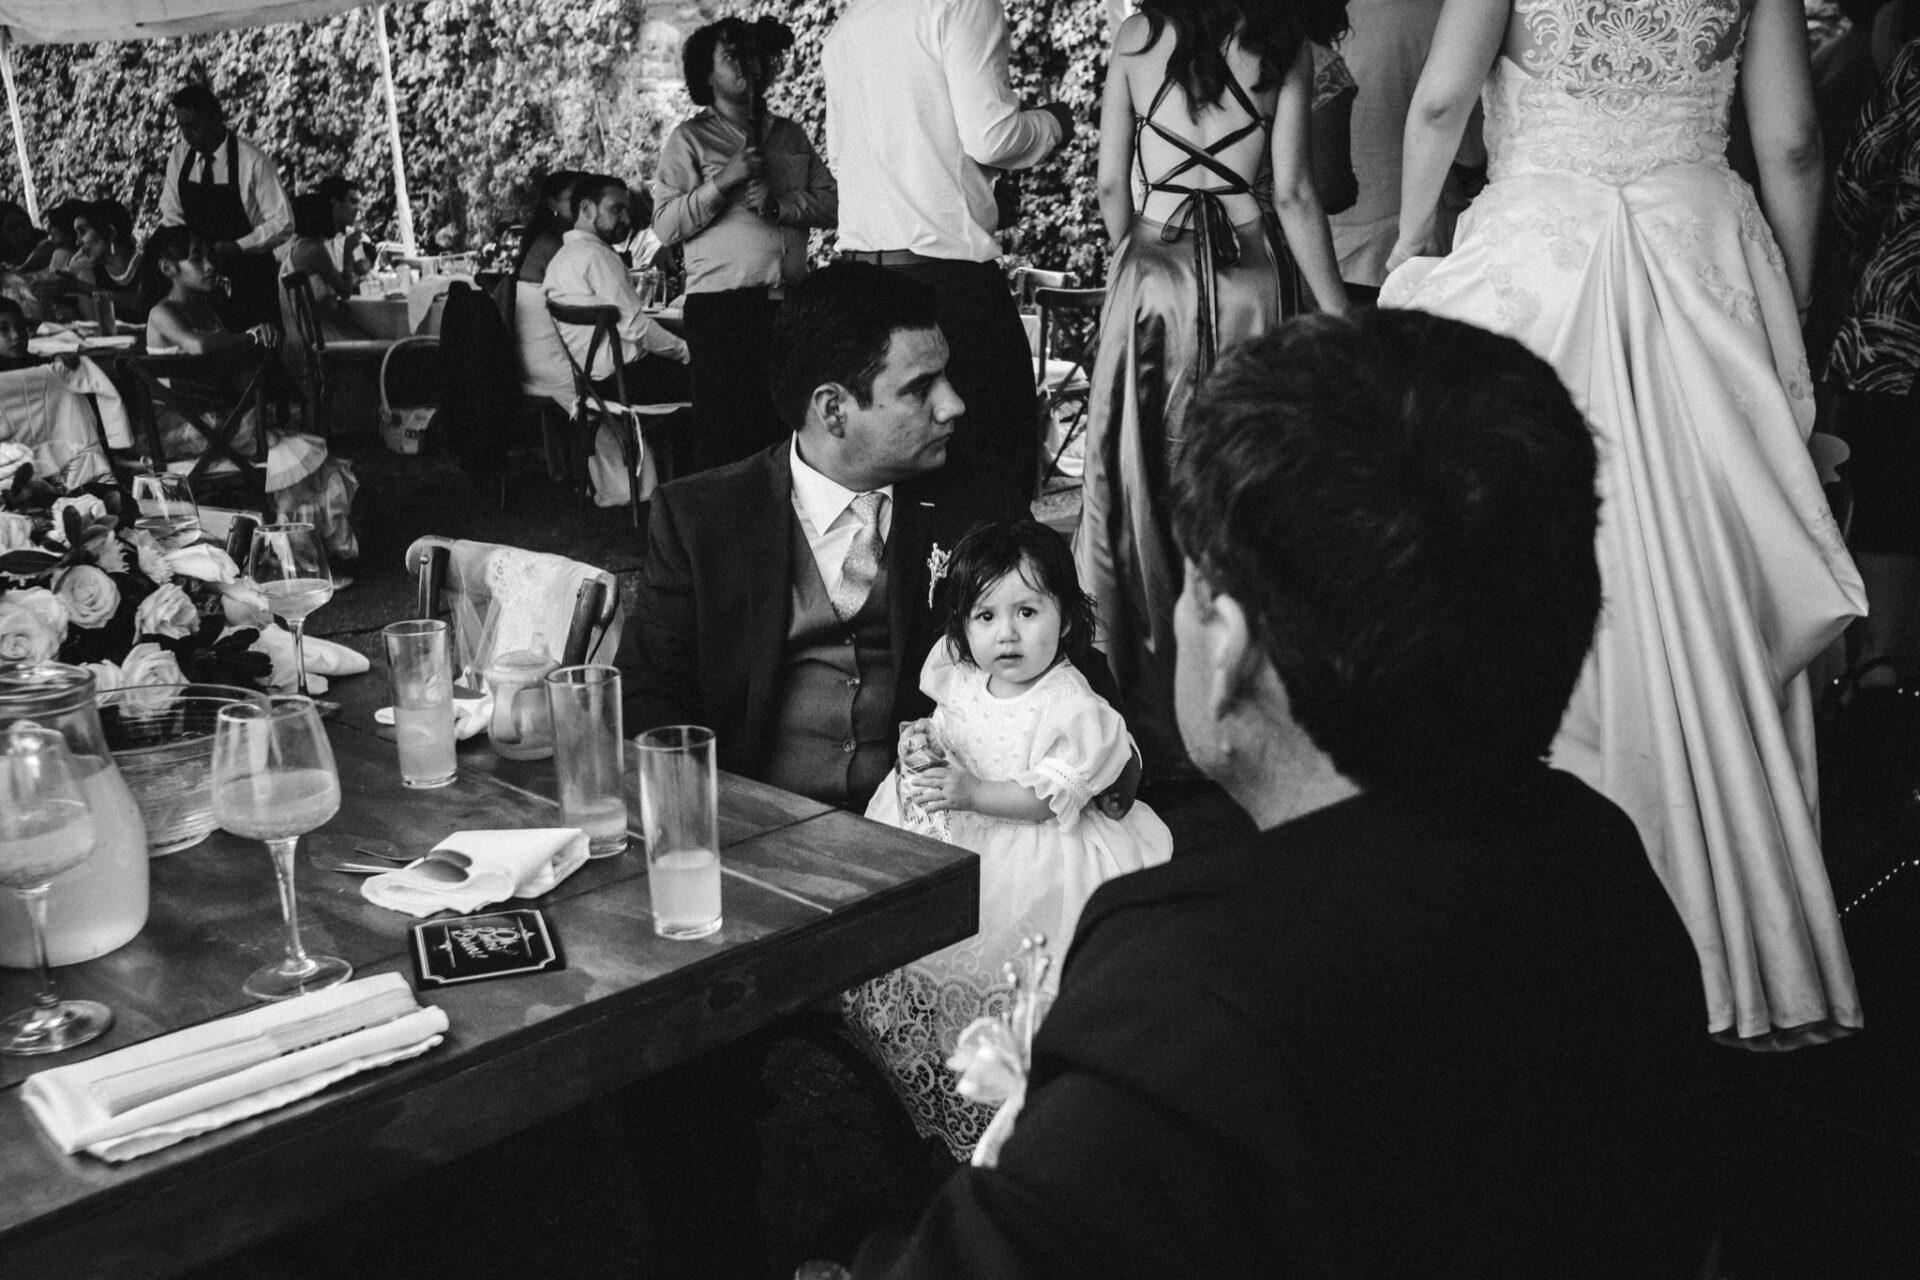 javier_noriega_fotografo_bodas_centro_platero_zacatecas_wedding_photographer35